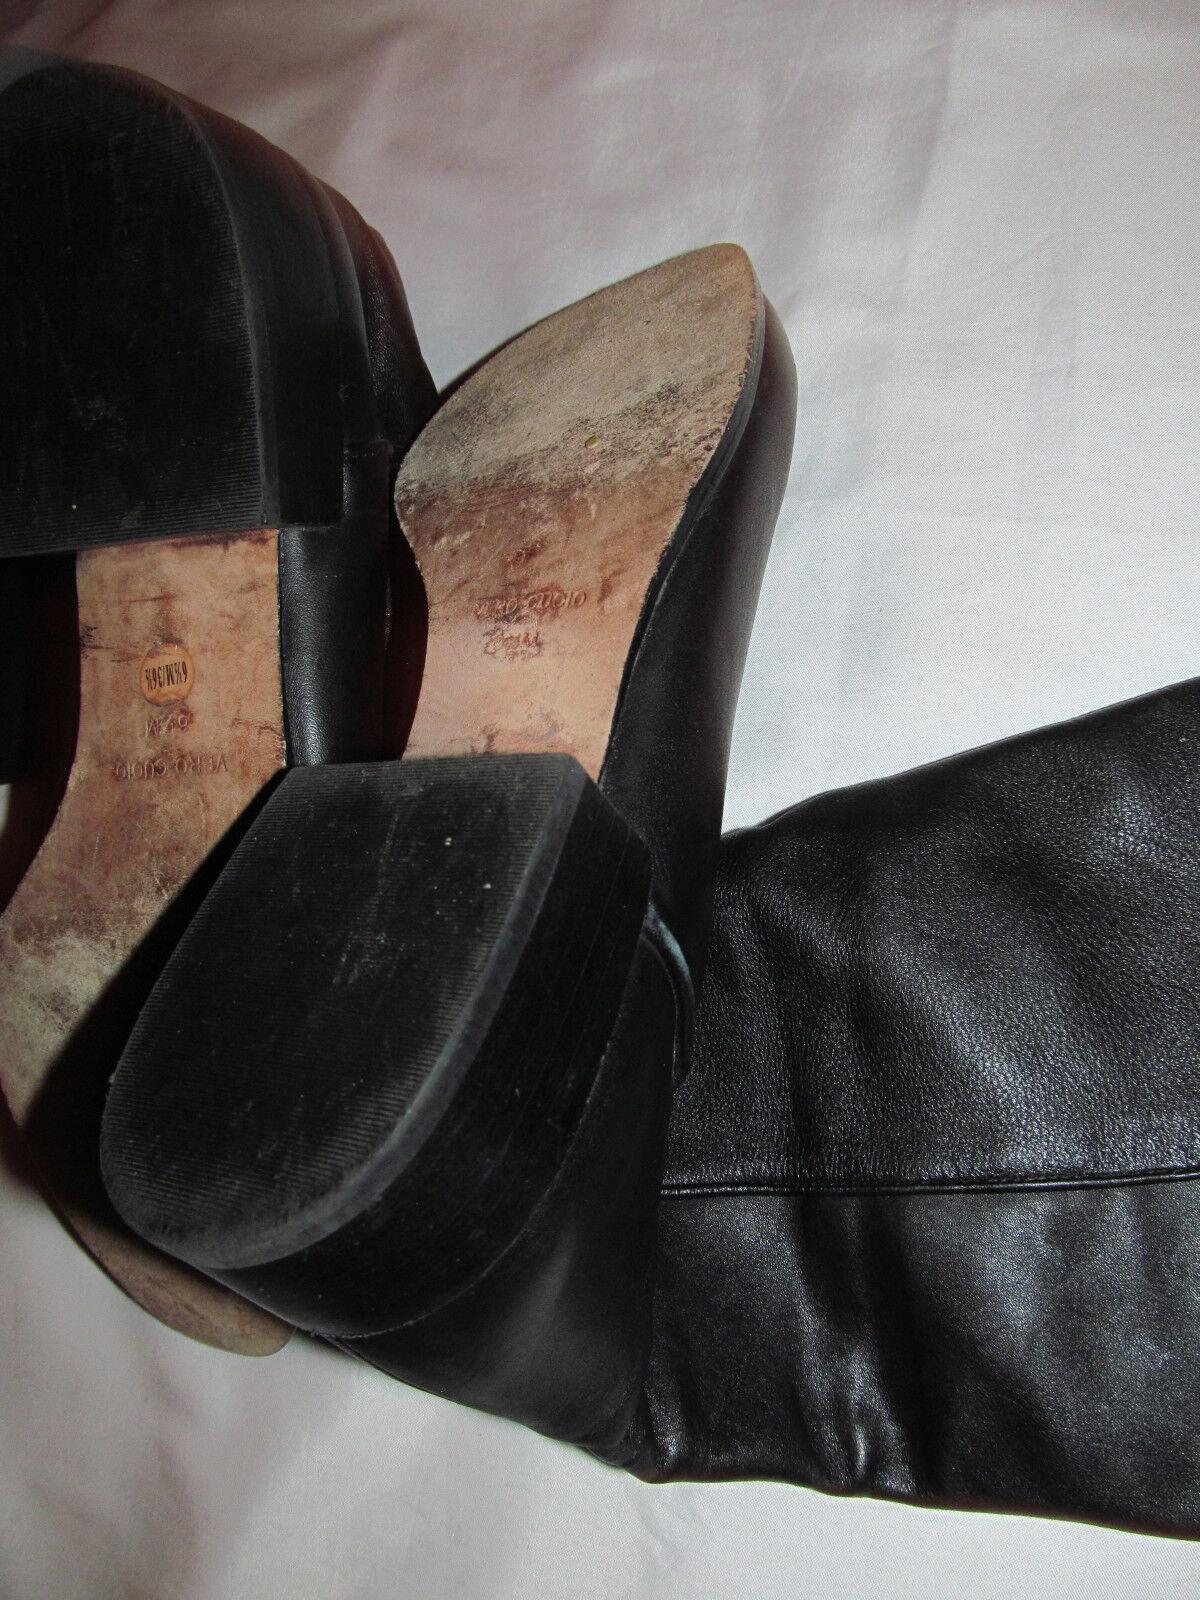 BCBG MAX AZRIA CENTRAL MACHIATO knee high riding straps buckles boots 6.5 M